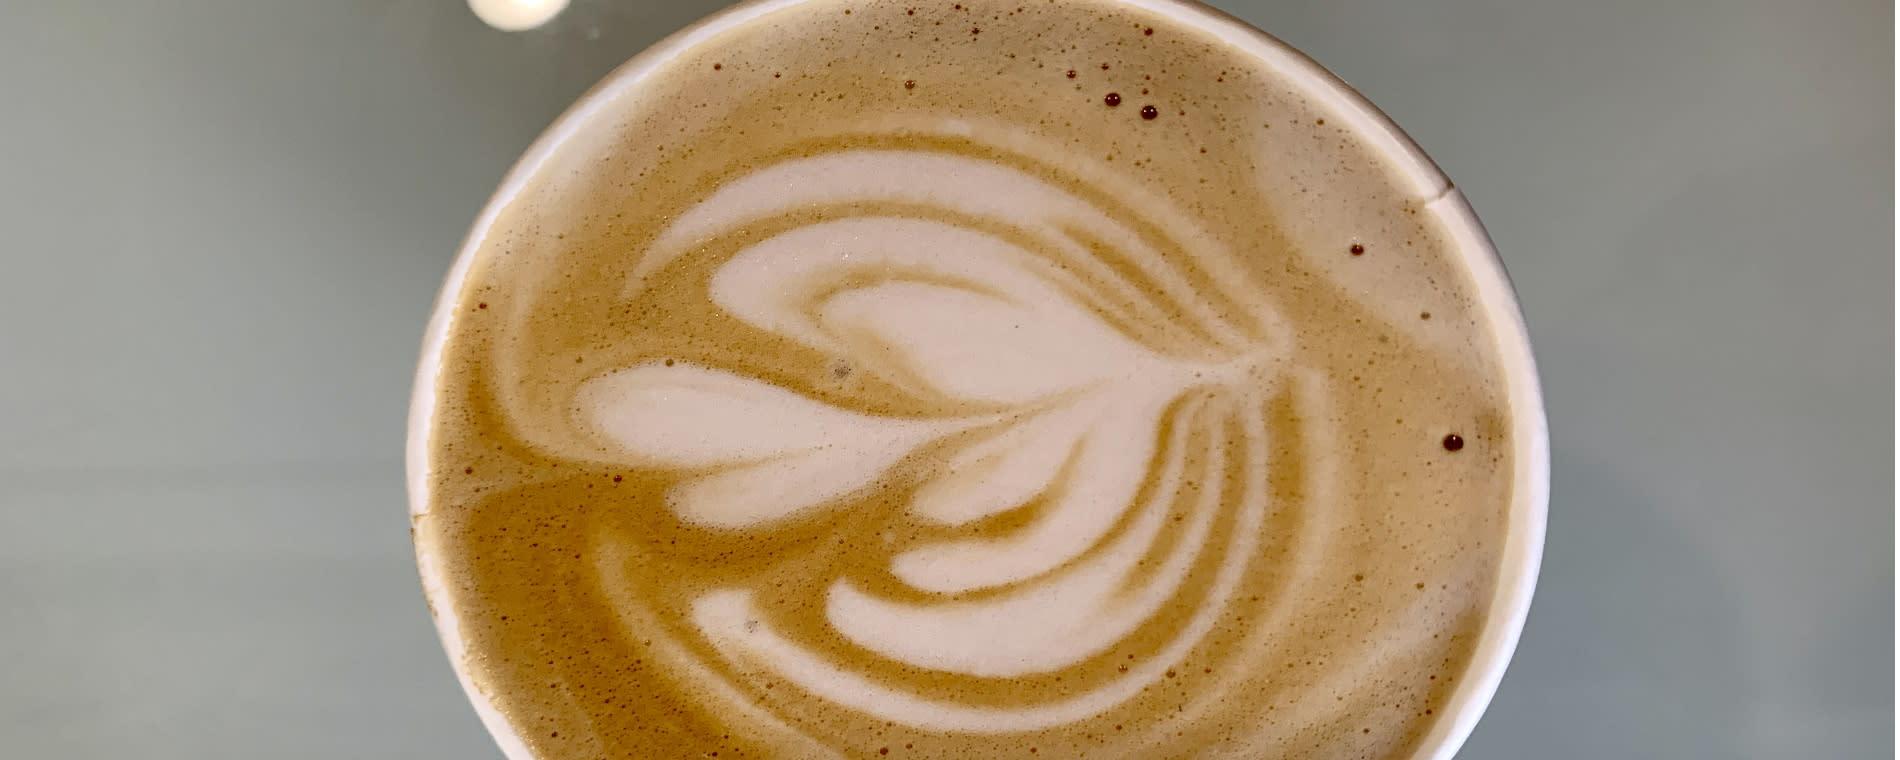 Coffee Placeholder Header